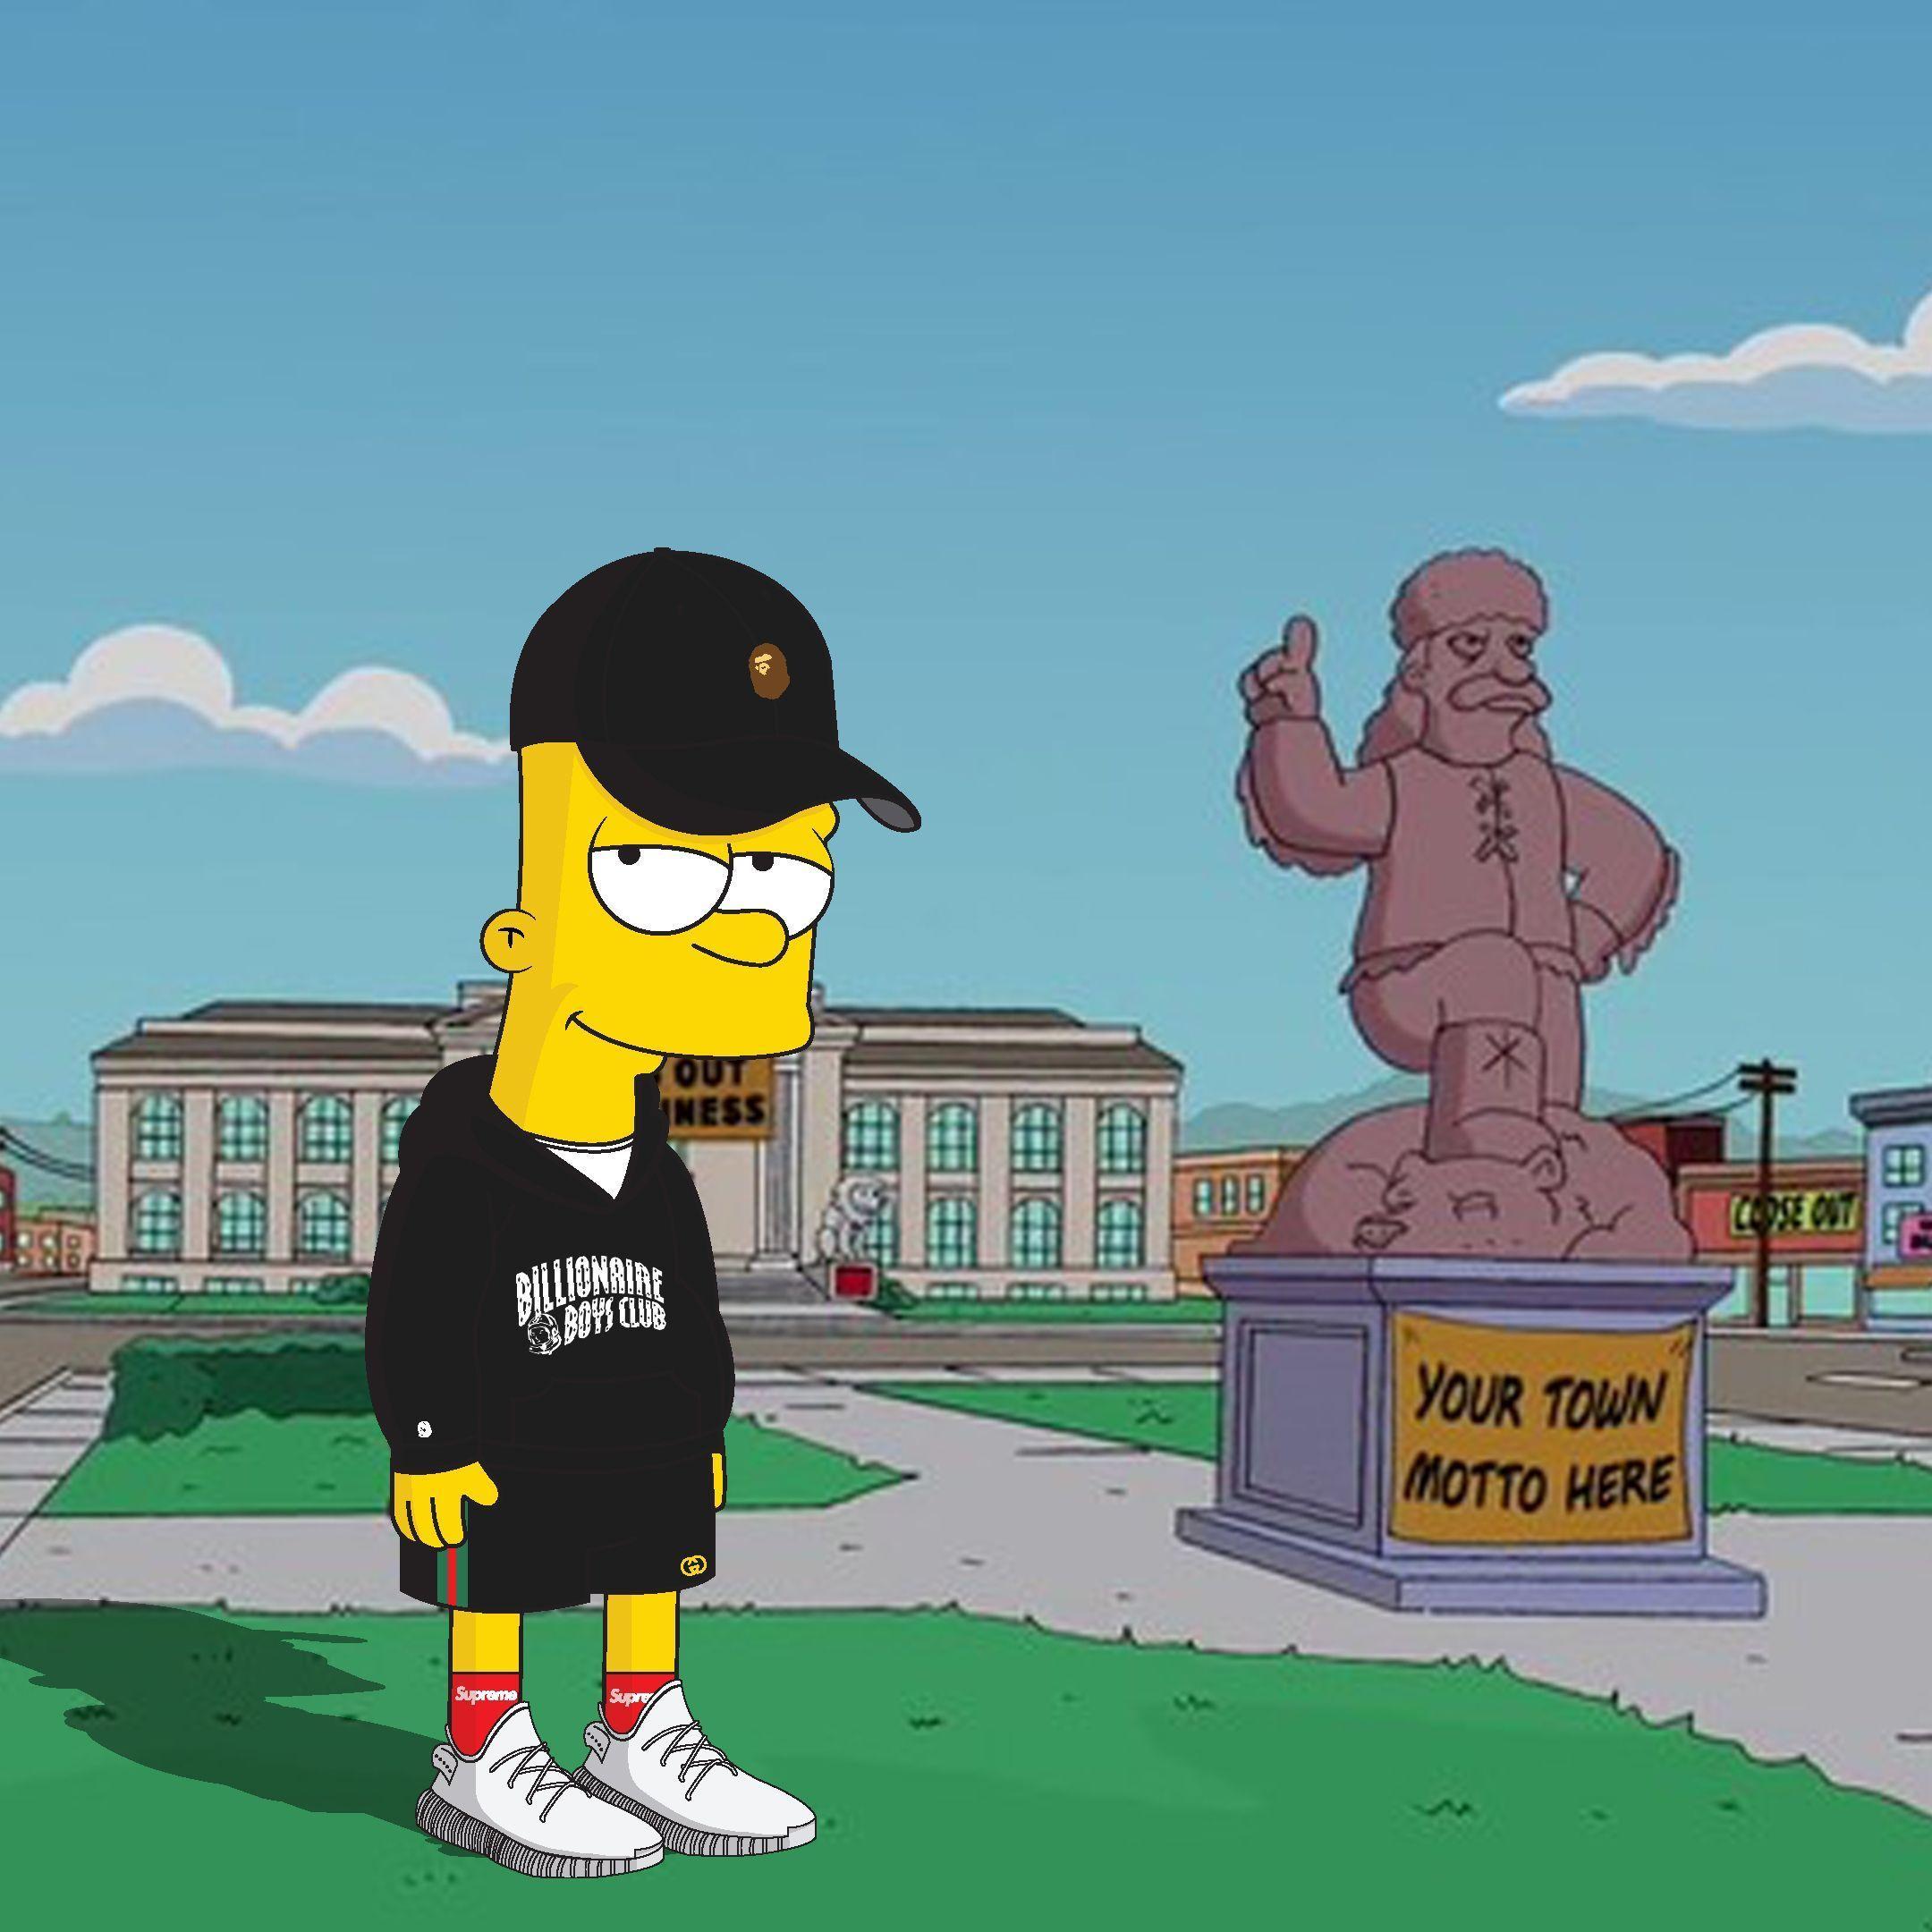 Hypebeast Bart Simpson Wallpapers Top Free Hypebeast Bart